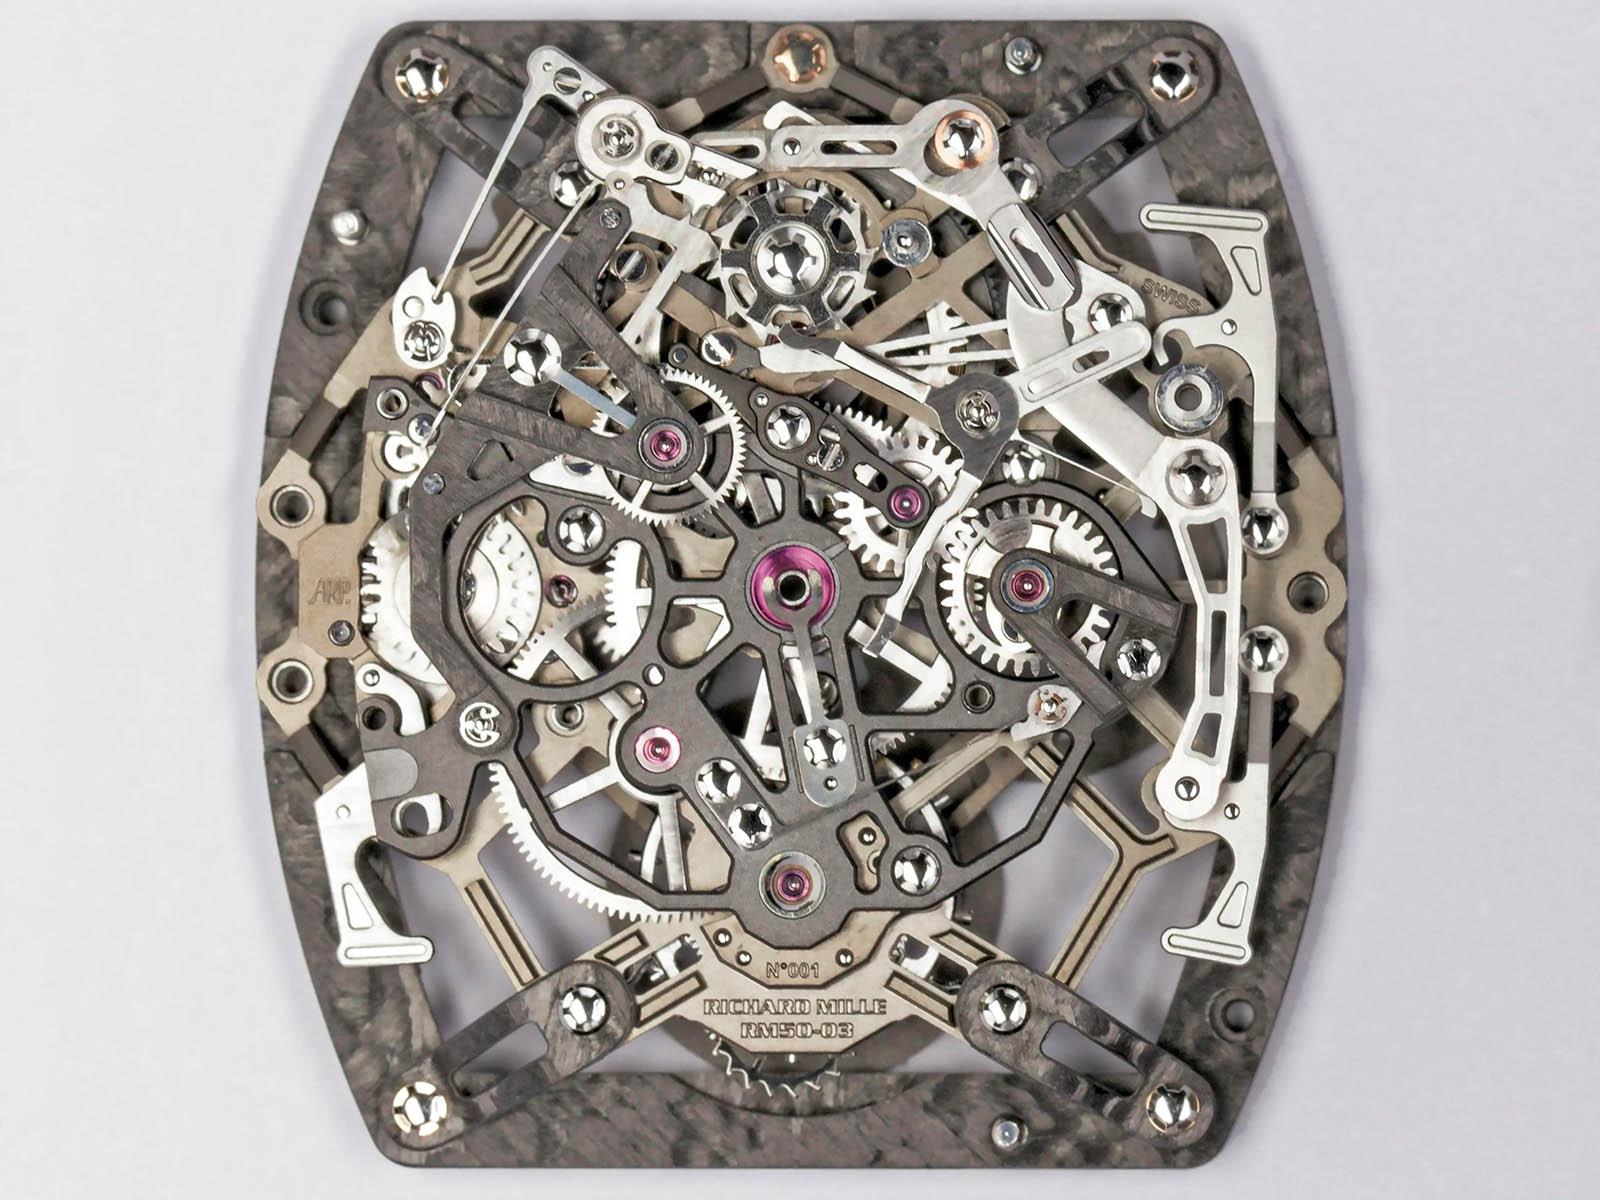 richard-mille-rm-50-04-tourbillon-split-seconds-chronograph-11.jpg